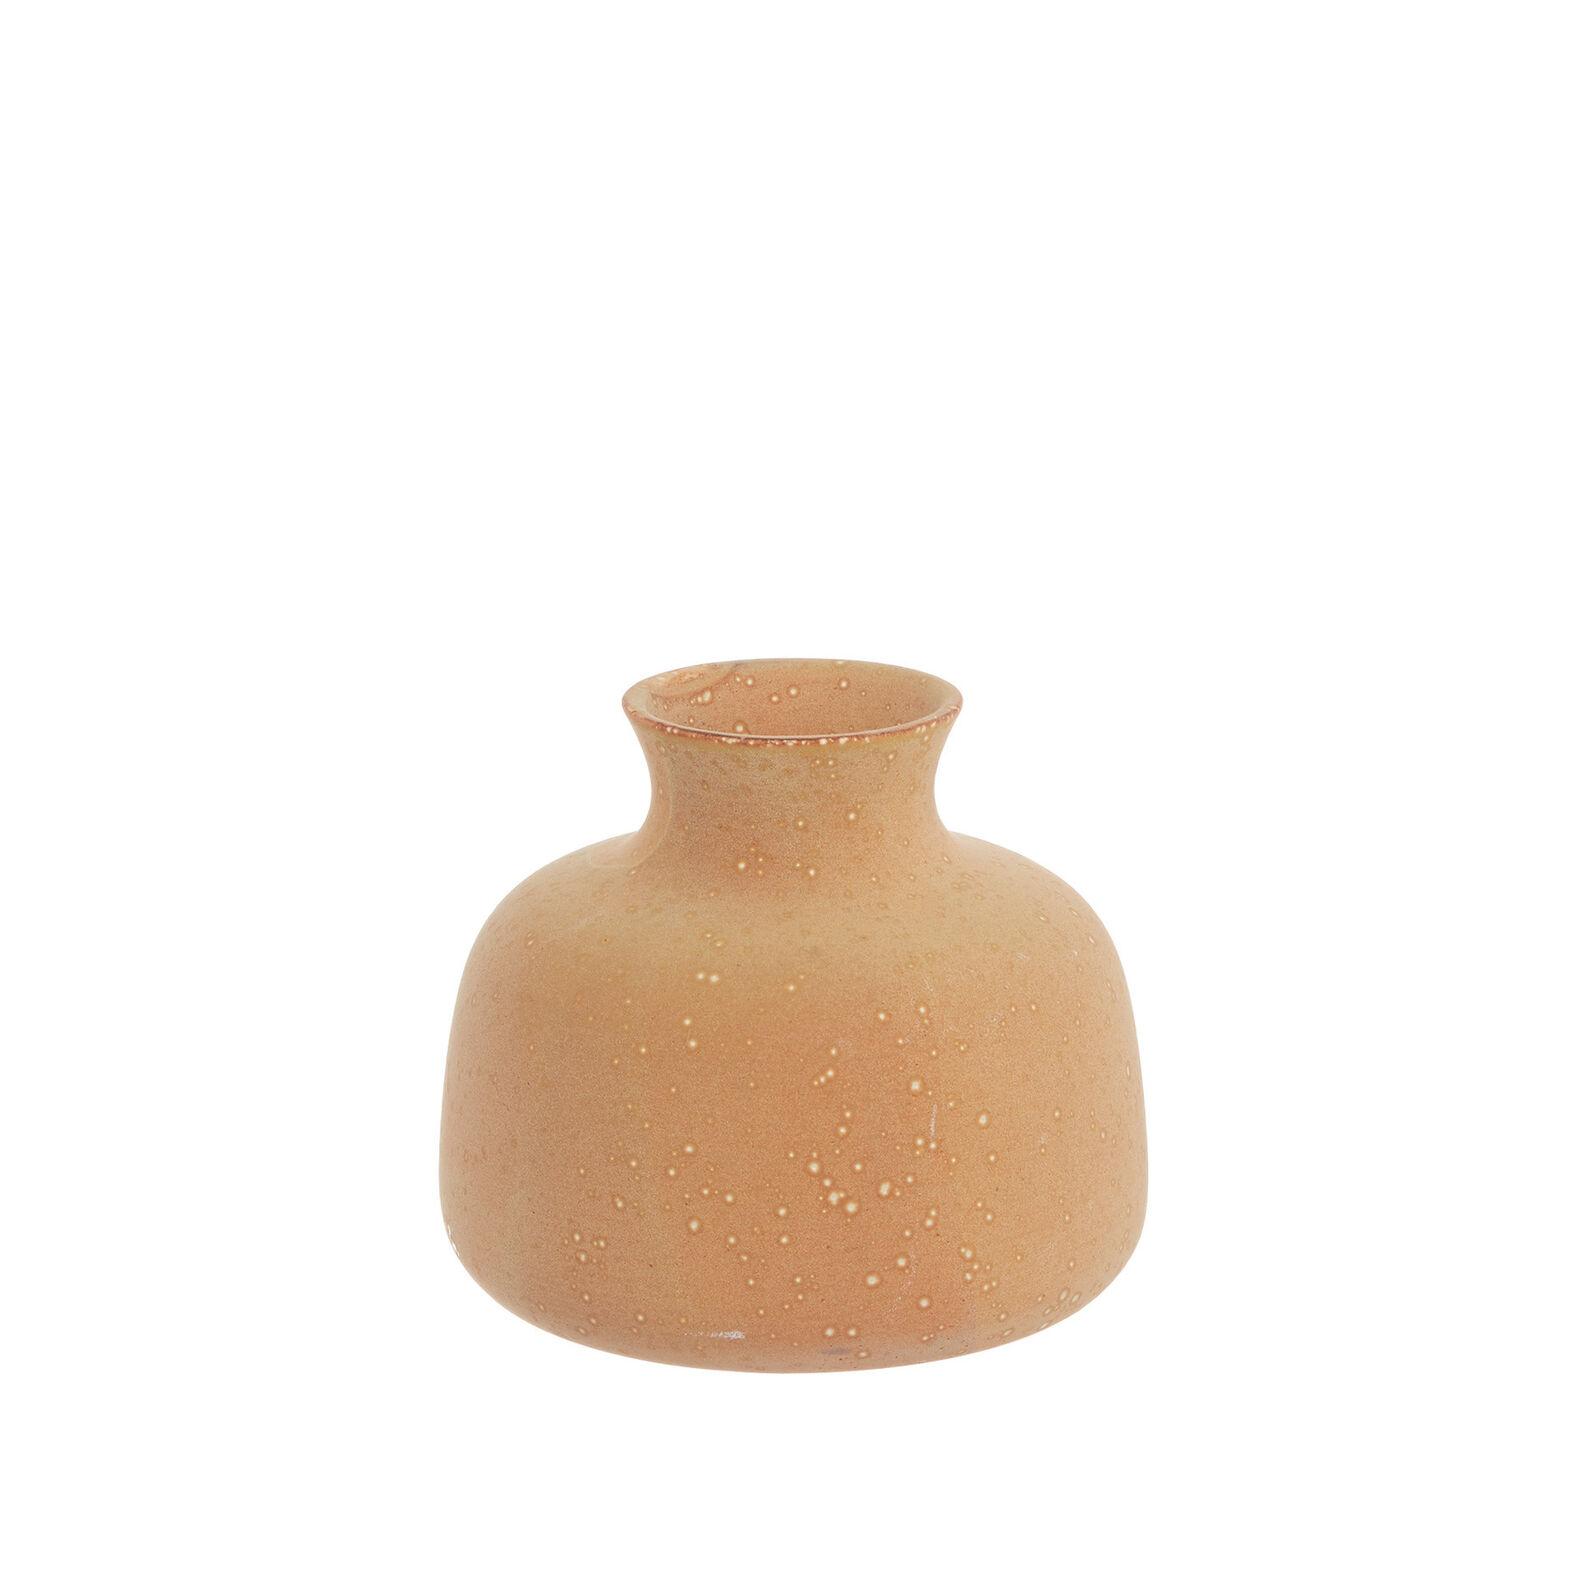 Portuguese terracotta vase